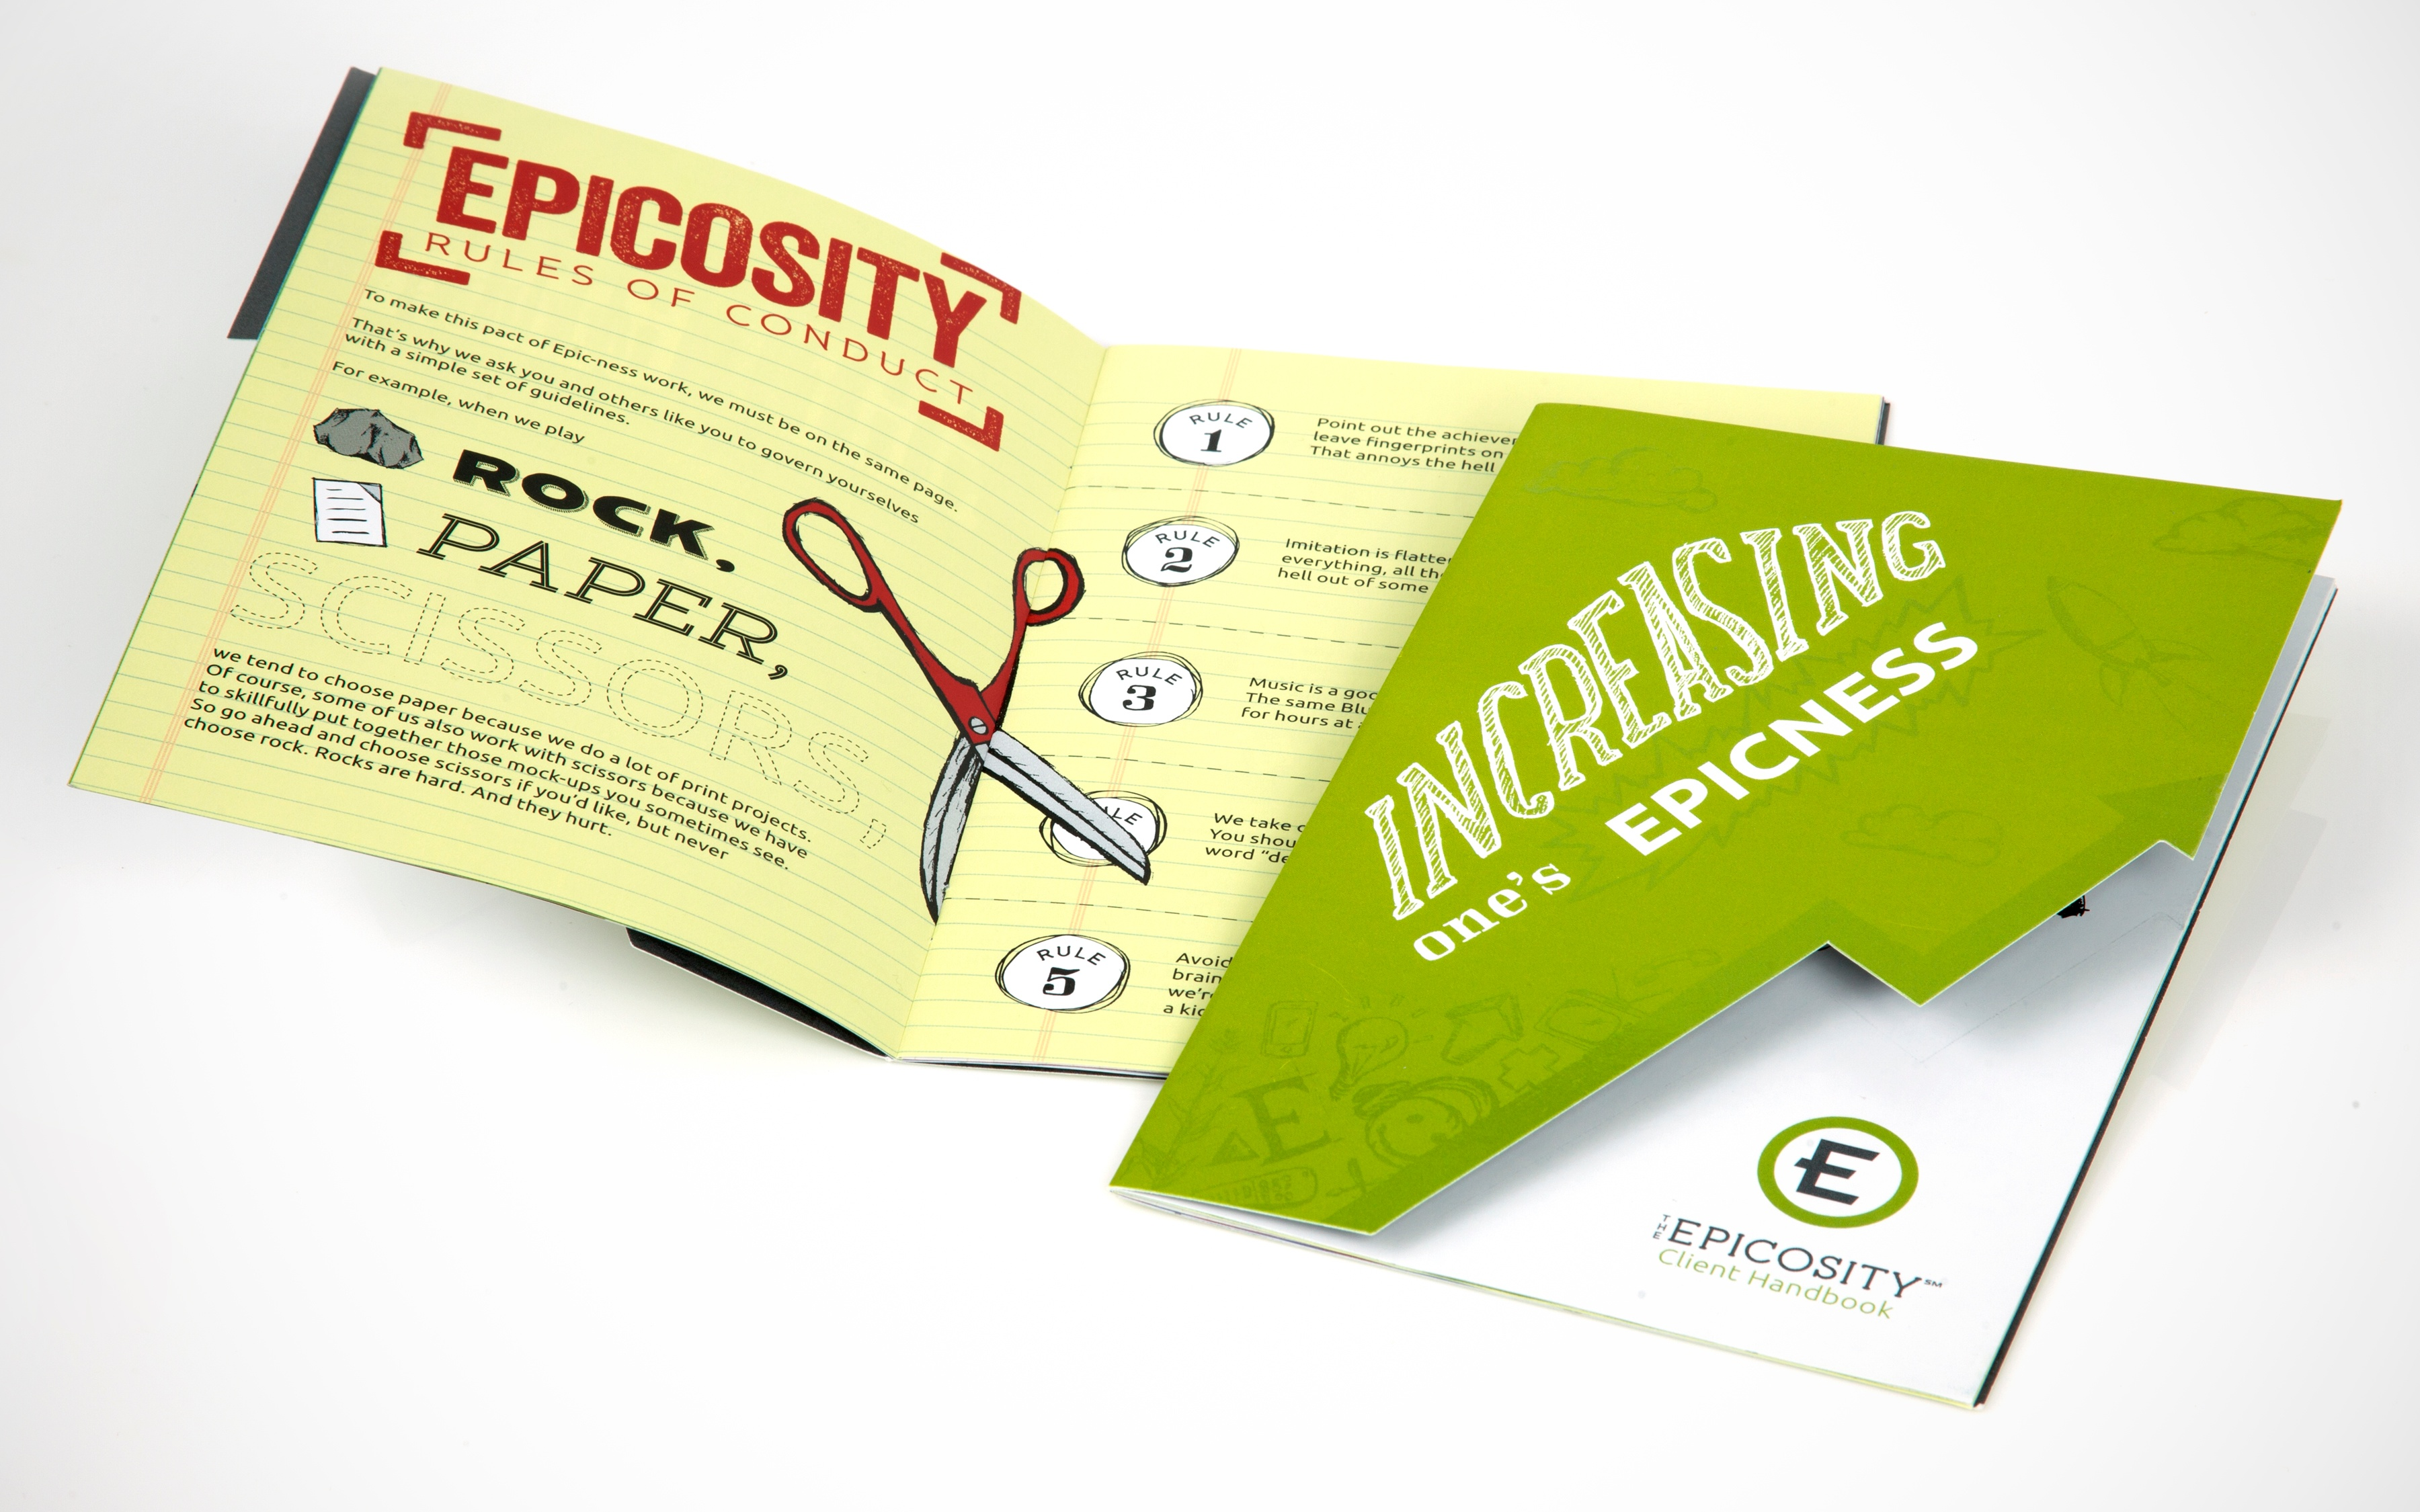 Epicosity_Handbook.jpg